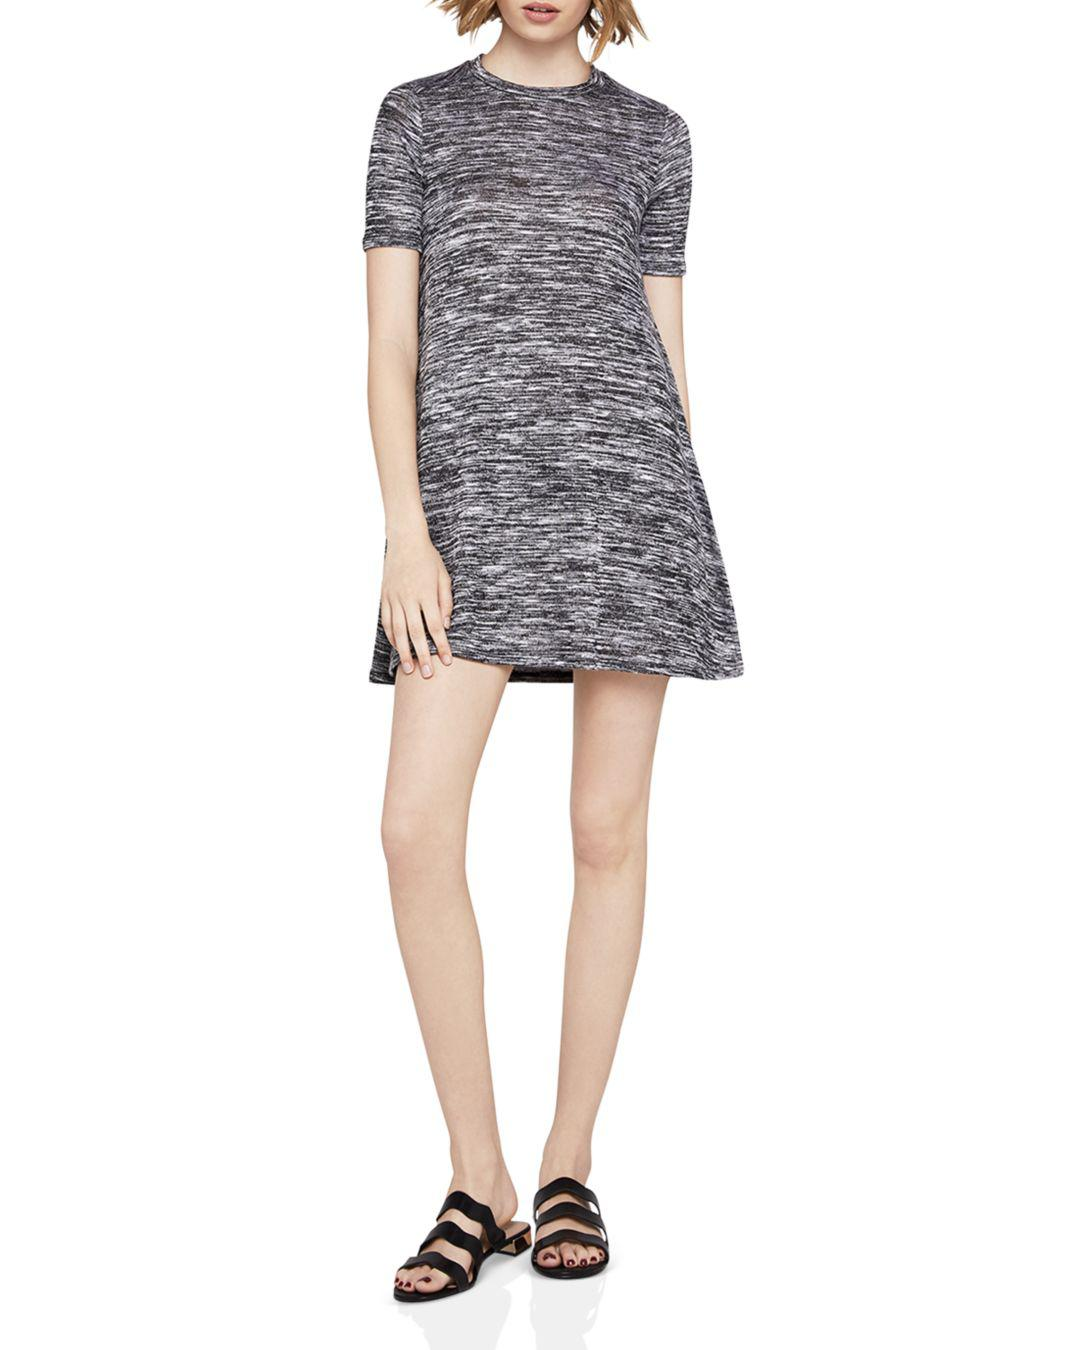 3140a542de7 Lyst - BCBGeneration Space-dye A-line Dress in Black